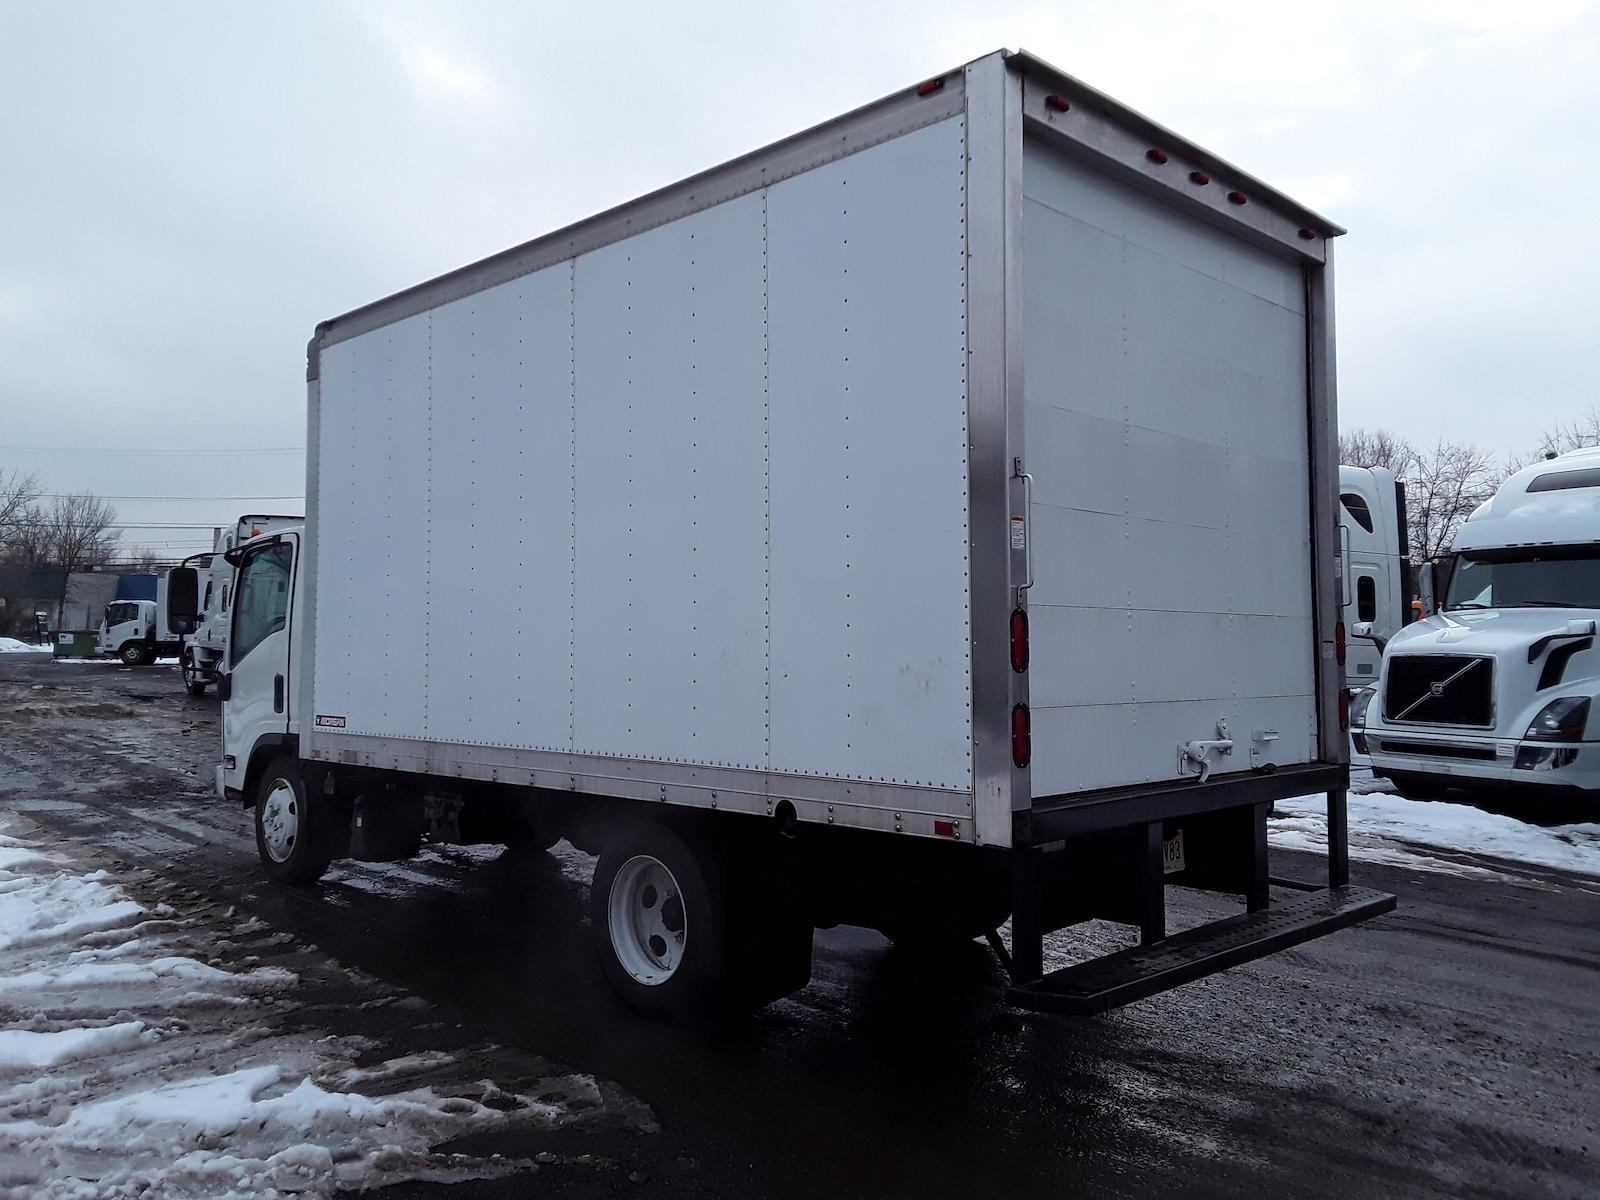 2015 Isuzu NQR Regular Cab 4x2, Dry Freight #329155 - photo 1